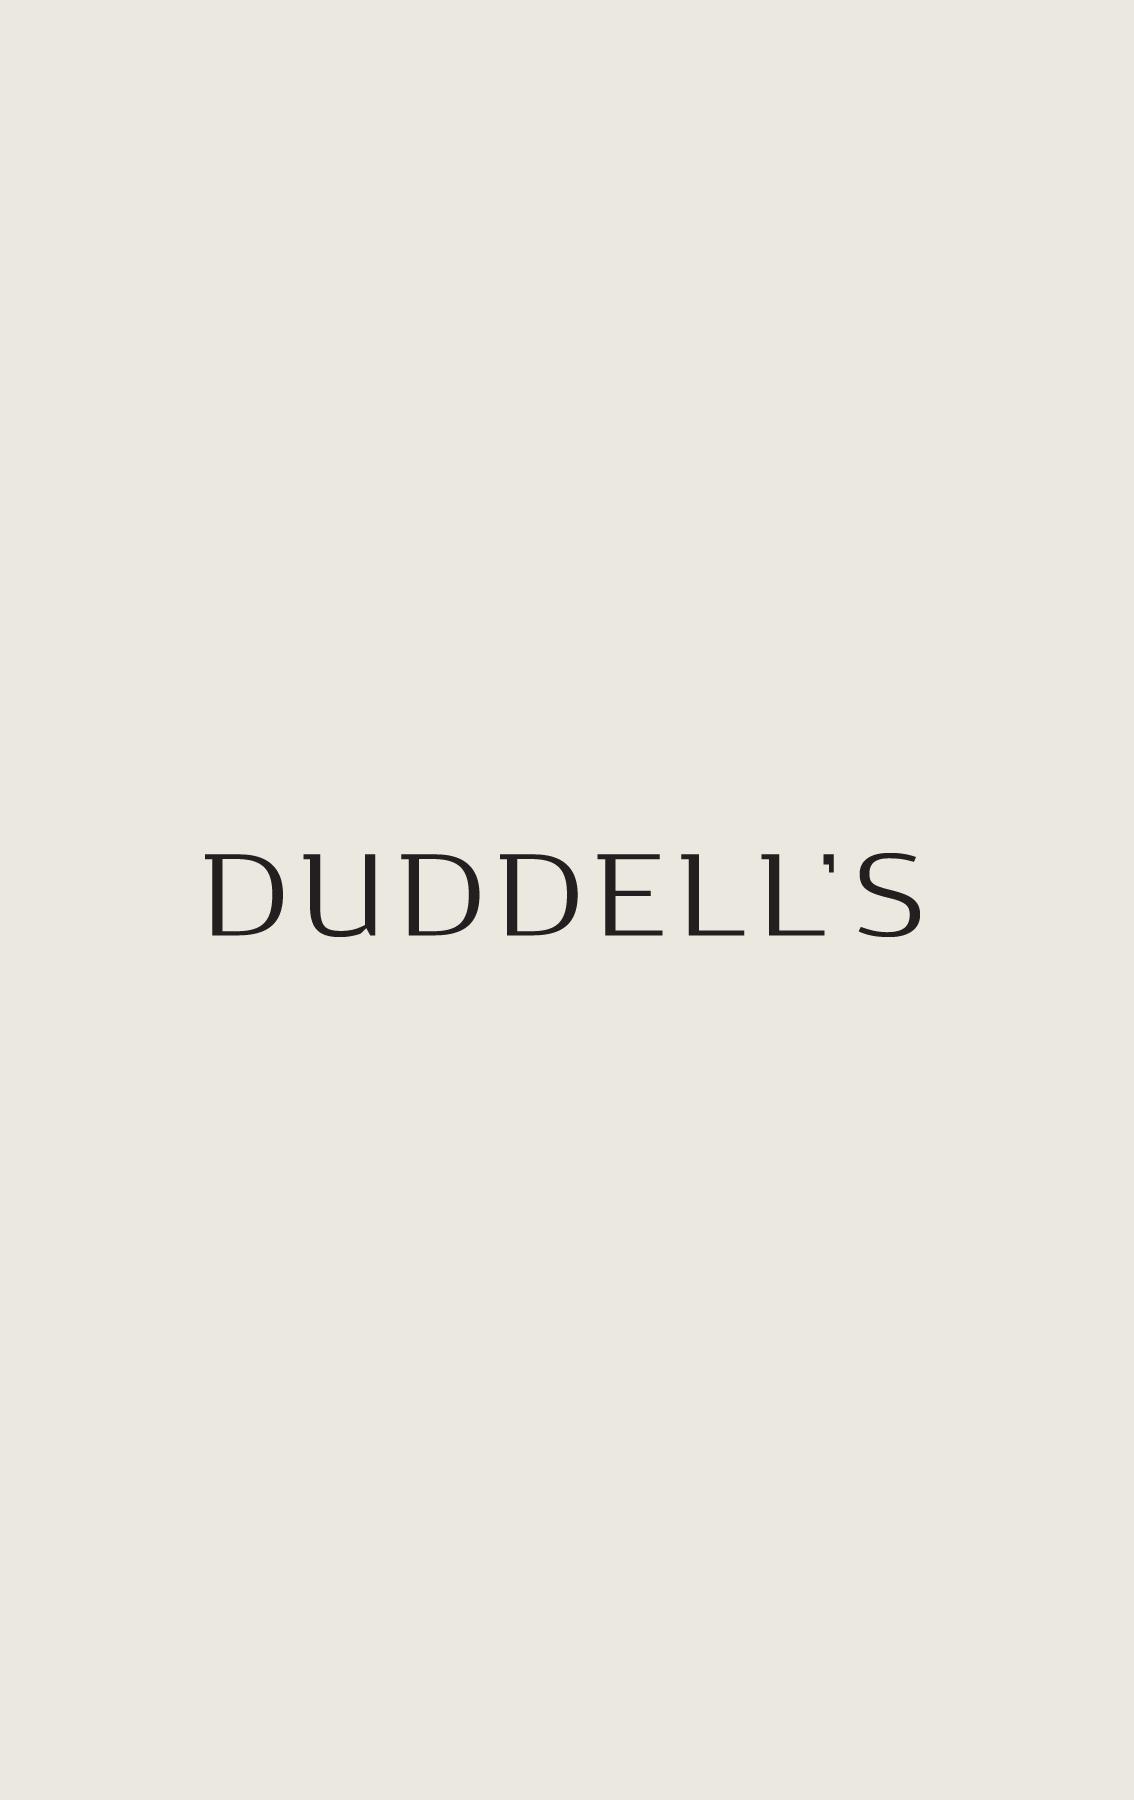 Duddells